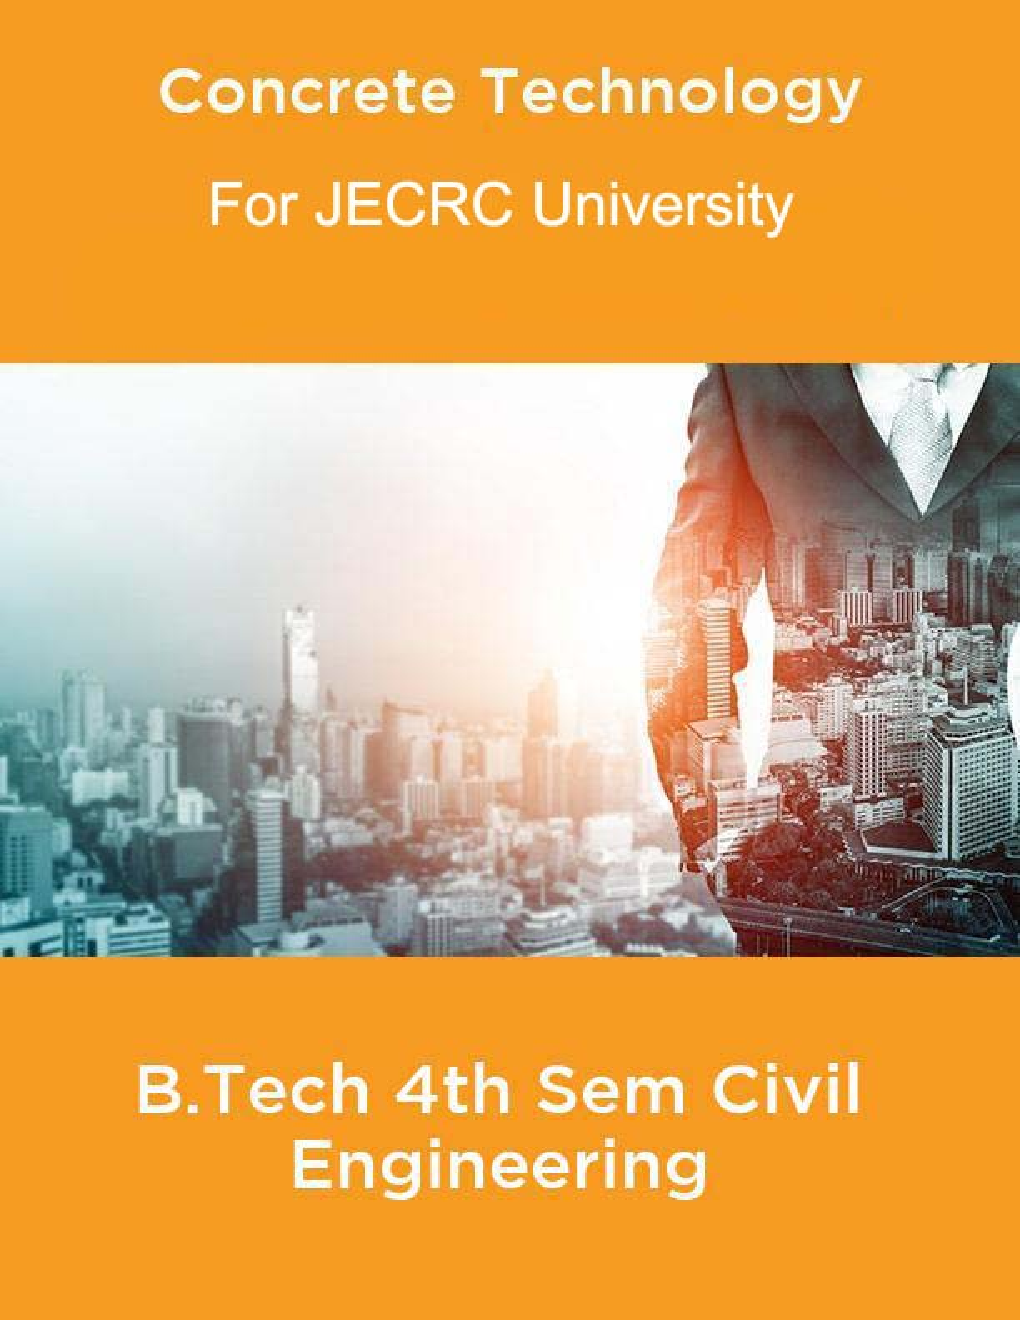 Concrete Technology B.Tech 4th Sem Civil Engineering For JECRC University - Page 1